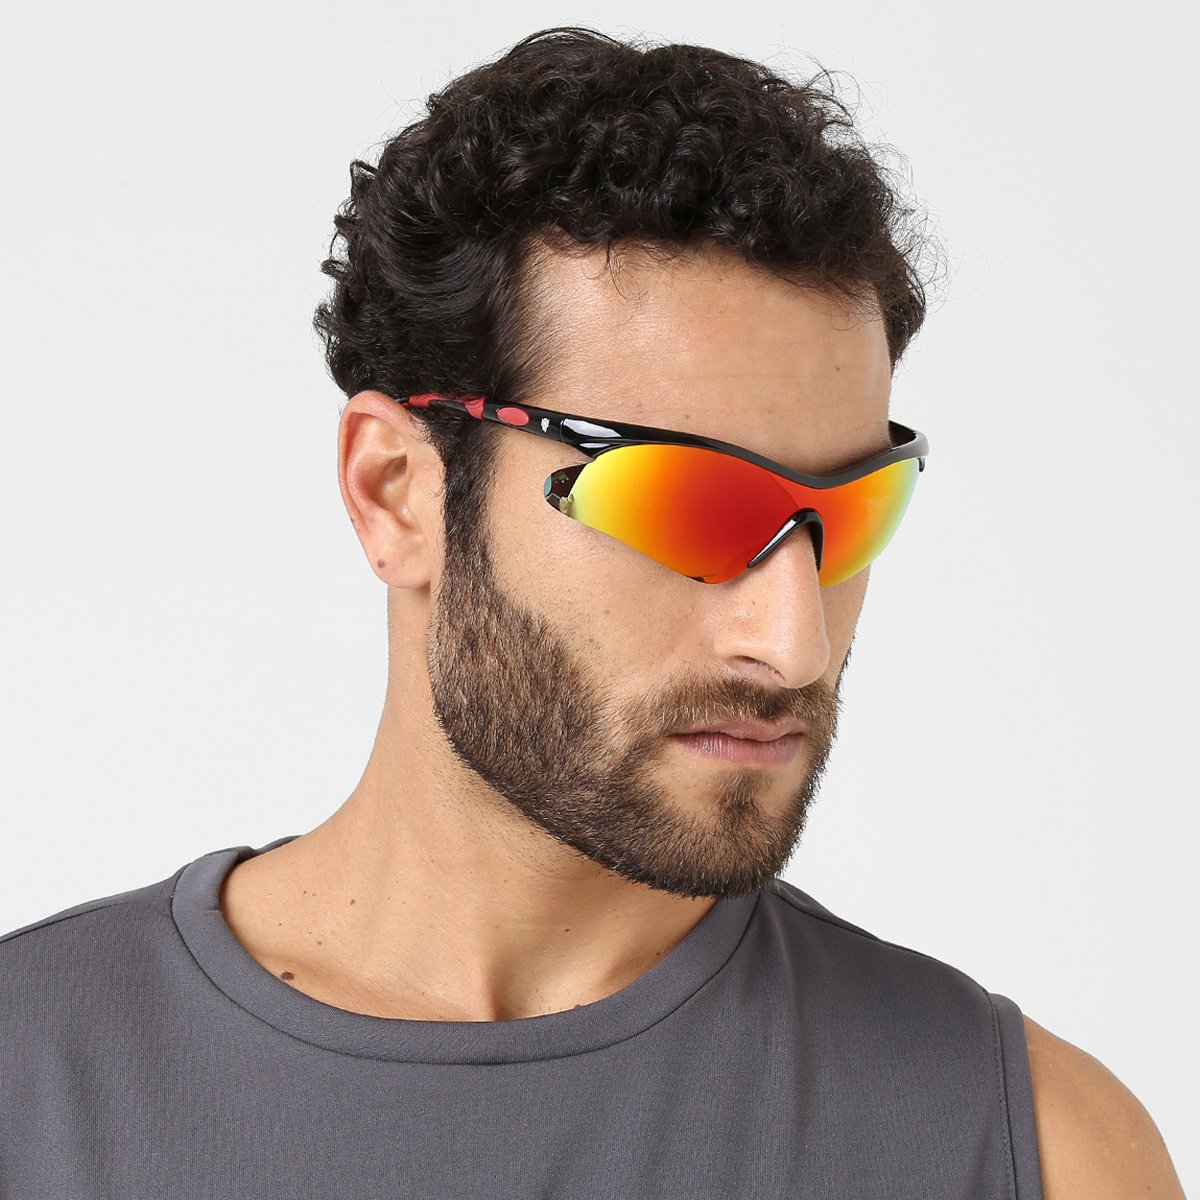 4452237ef15ae Óculos GONEW Advance - Polarizado - Compre Agora   Netshoes